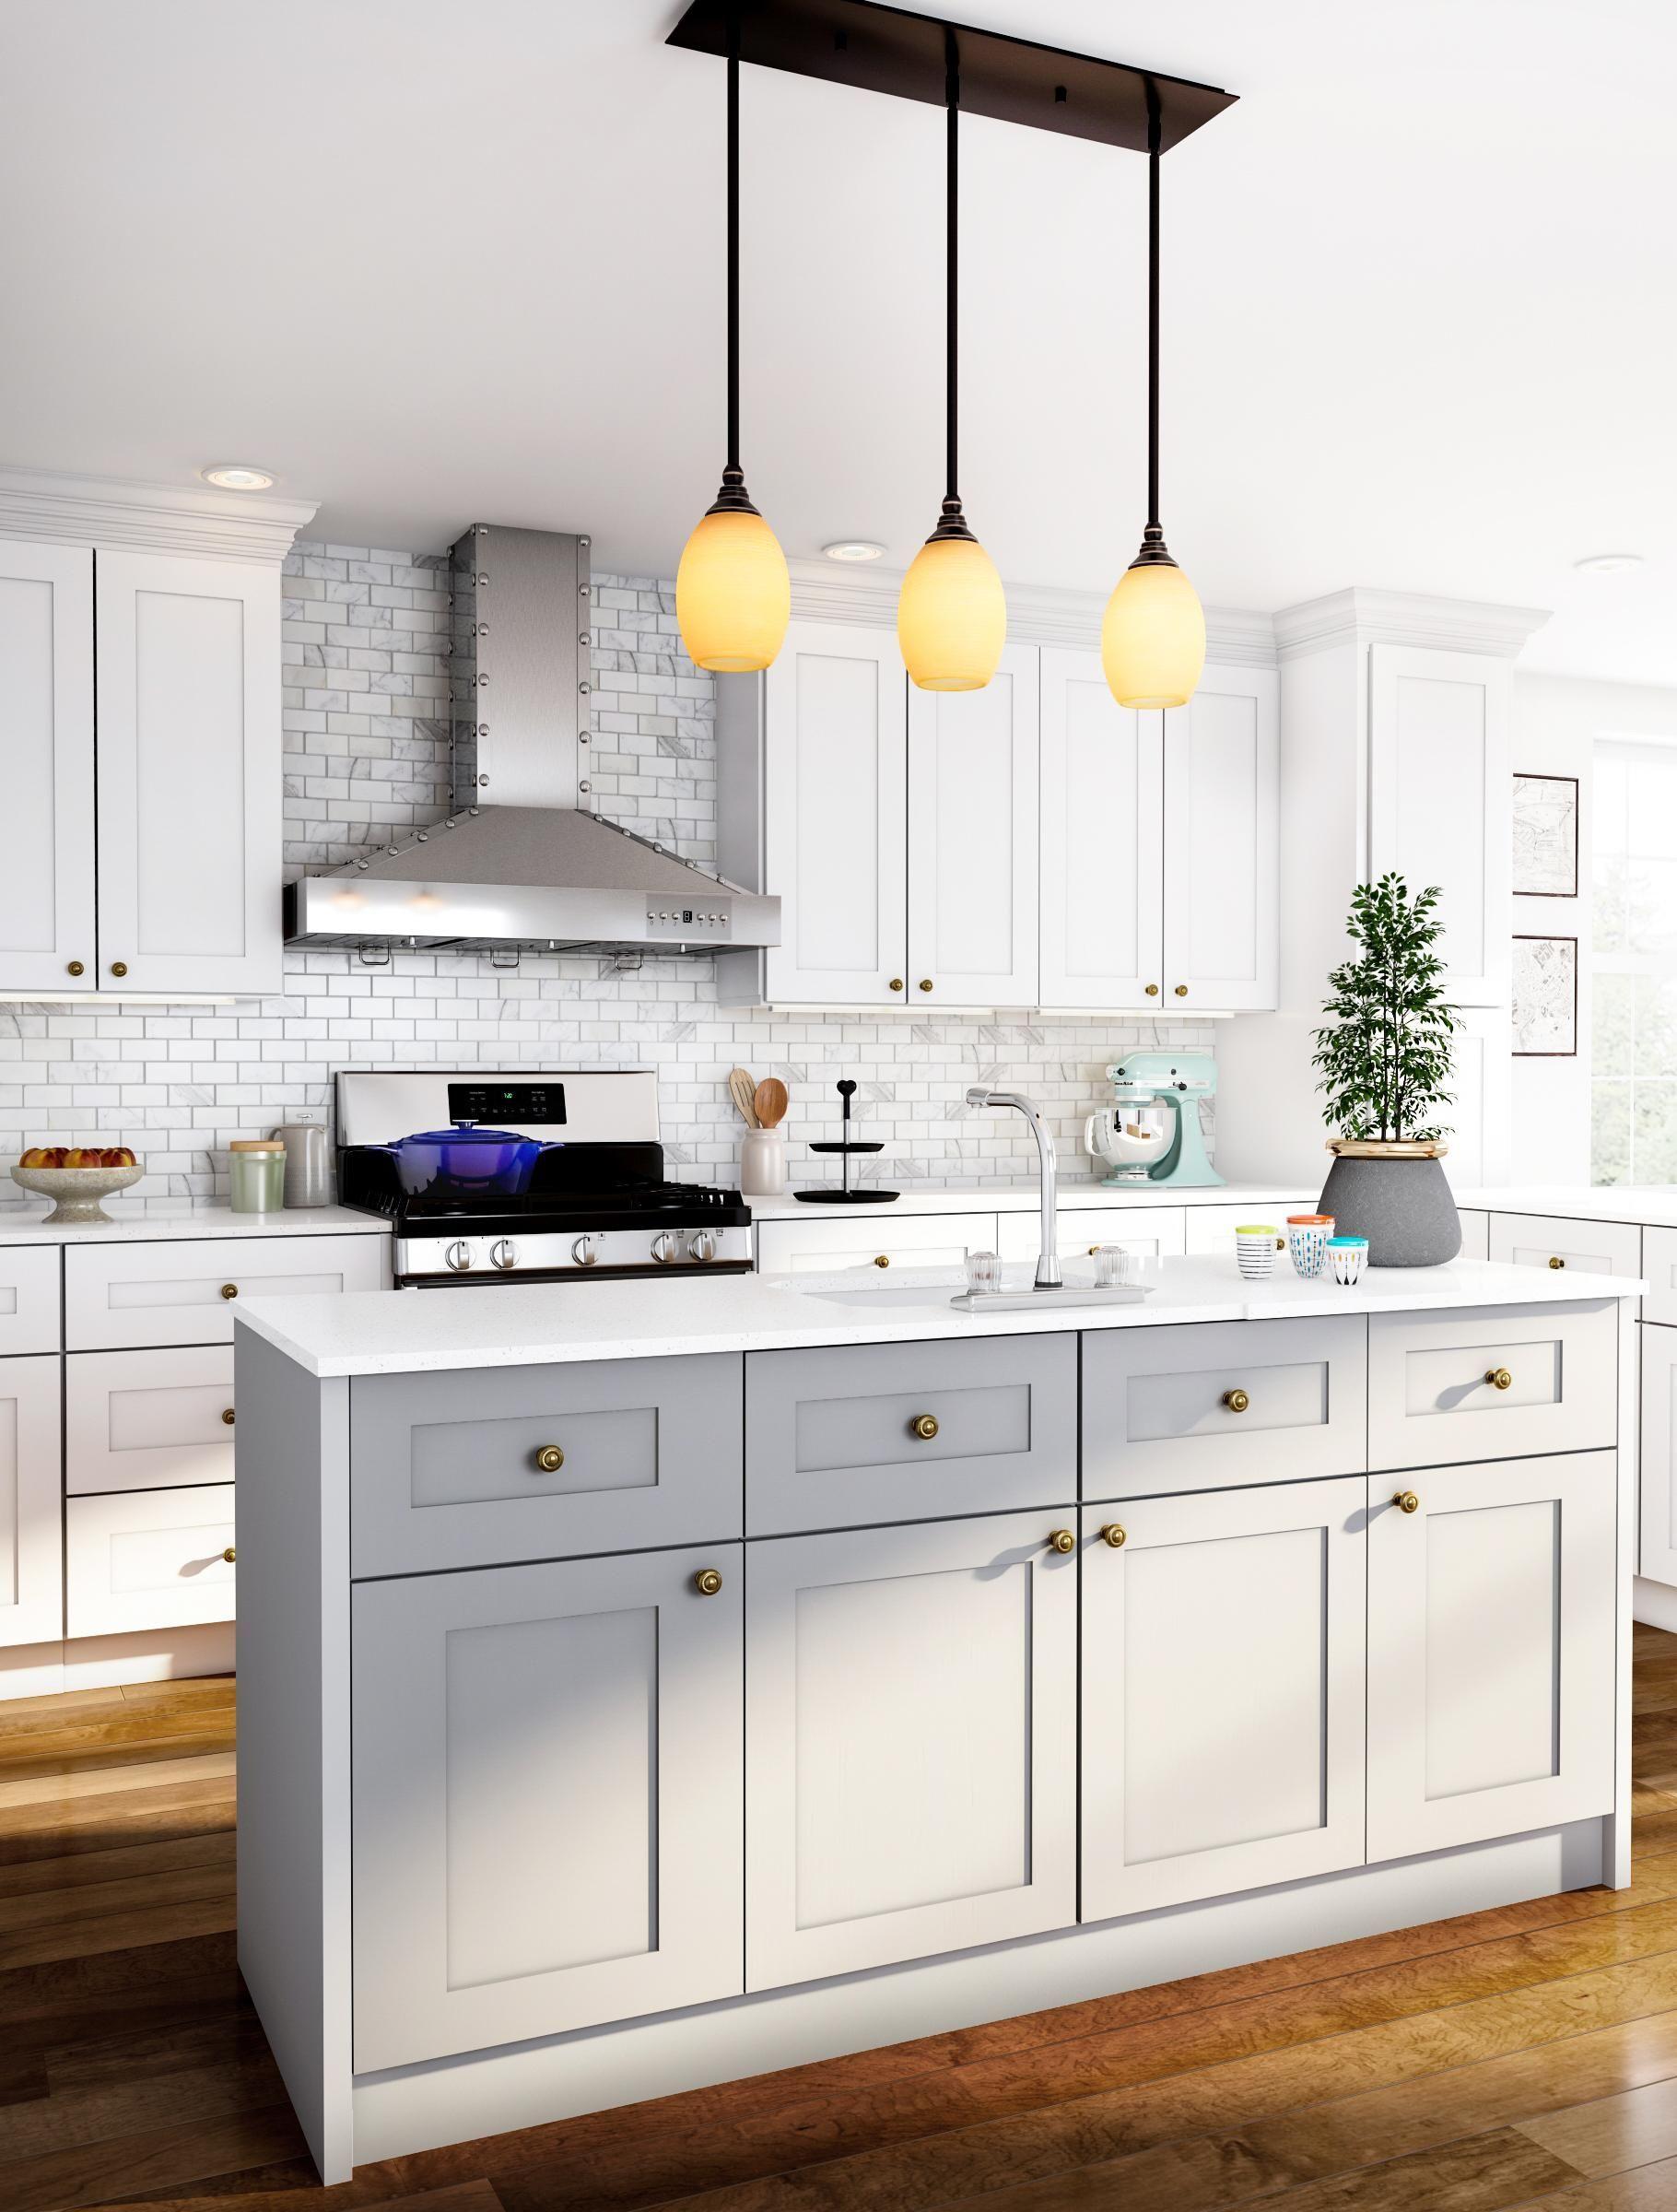 Kitchen Design Paint Colors Gray Cabinetry Grey Kitchen Designs Dark Grey Kitchen Cabinets White Kitchen Floor